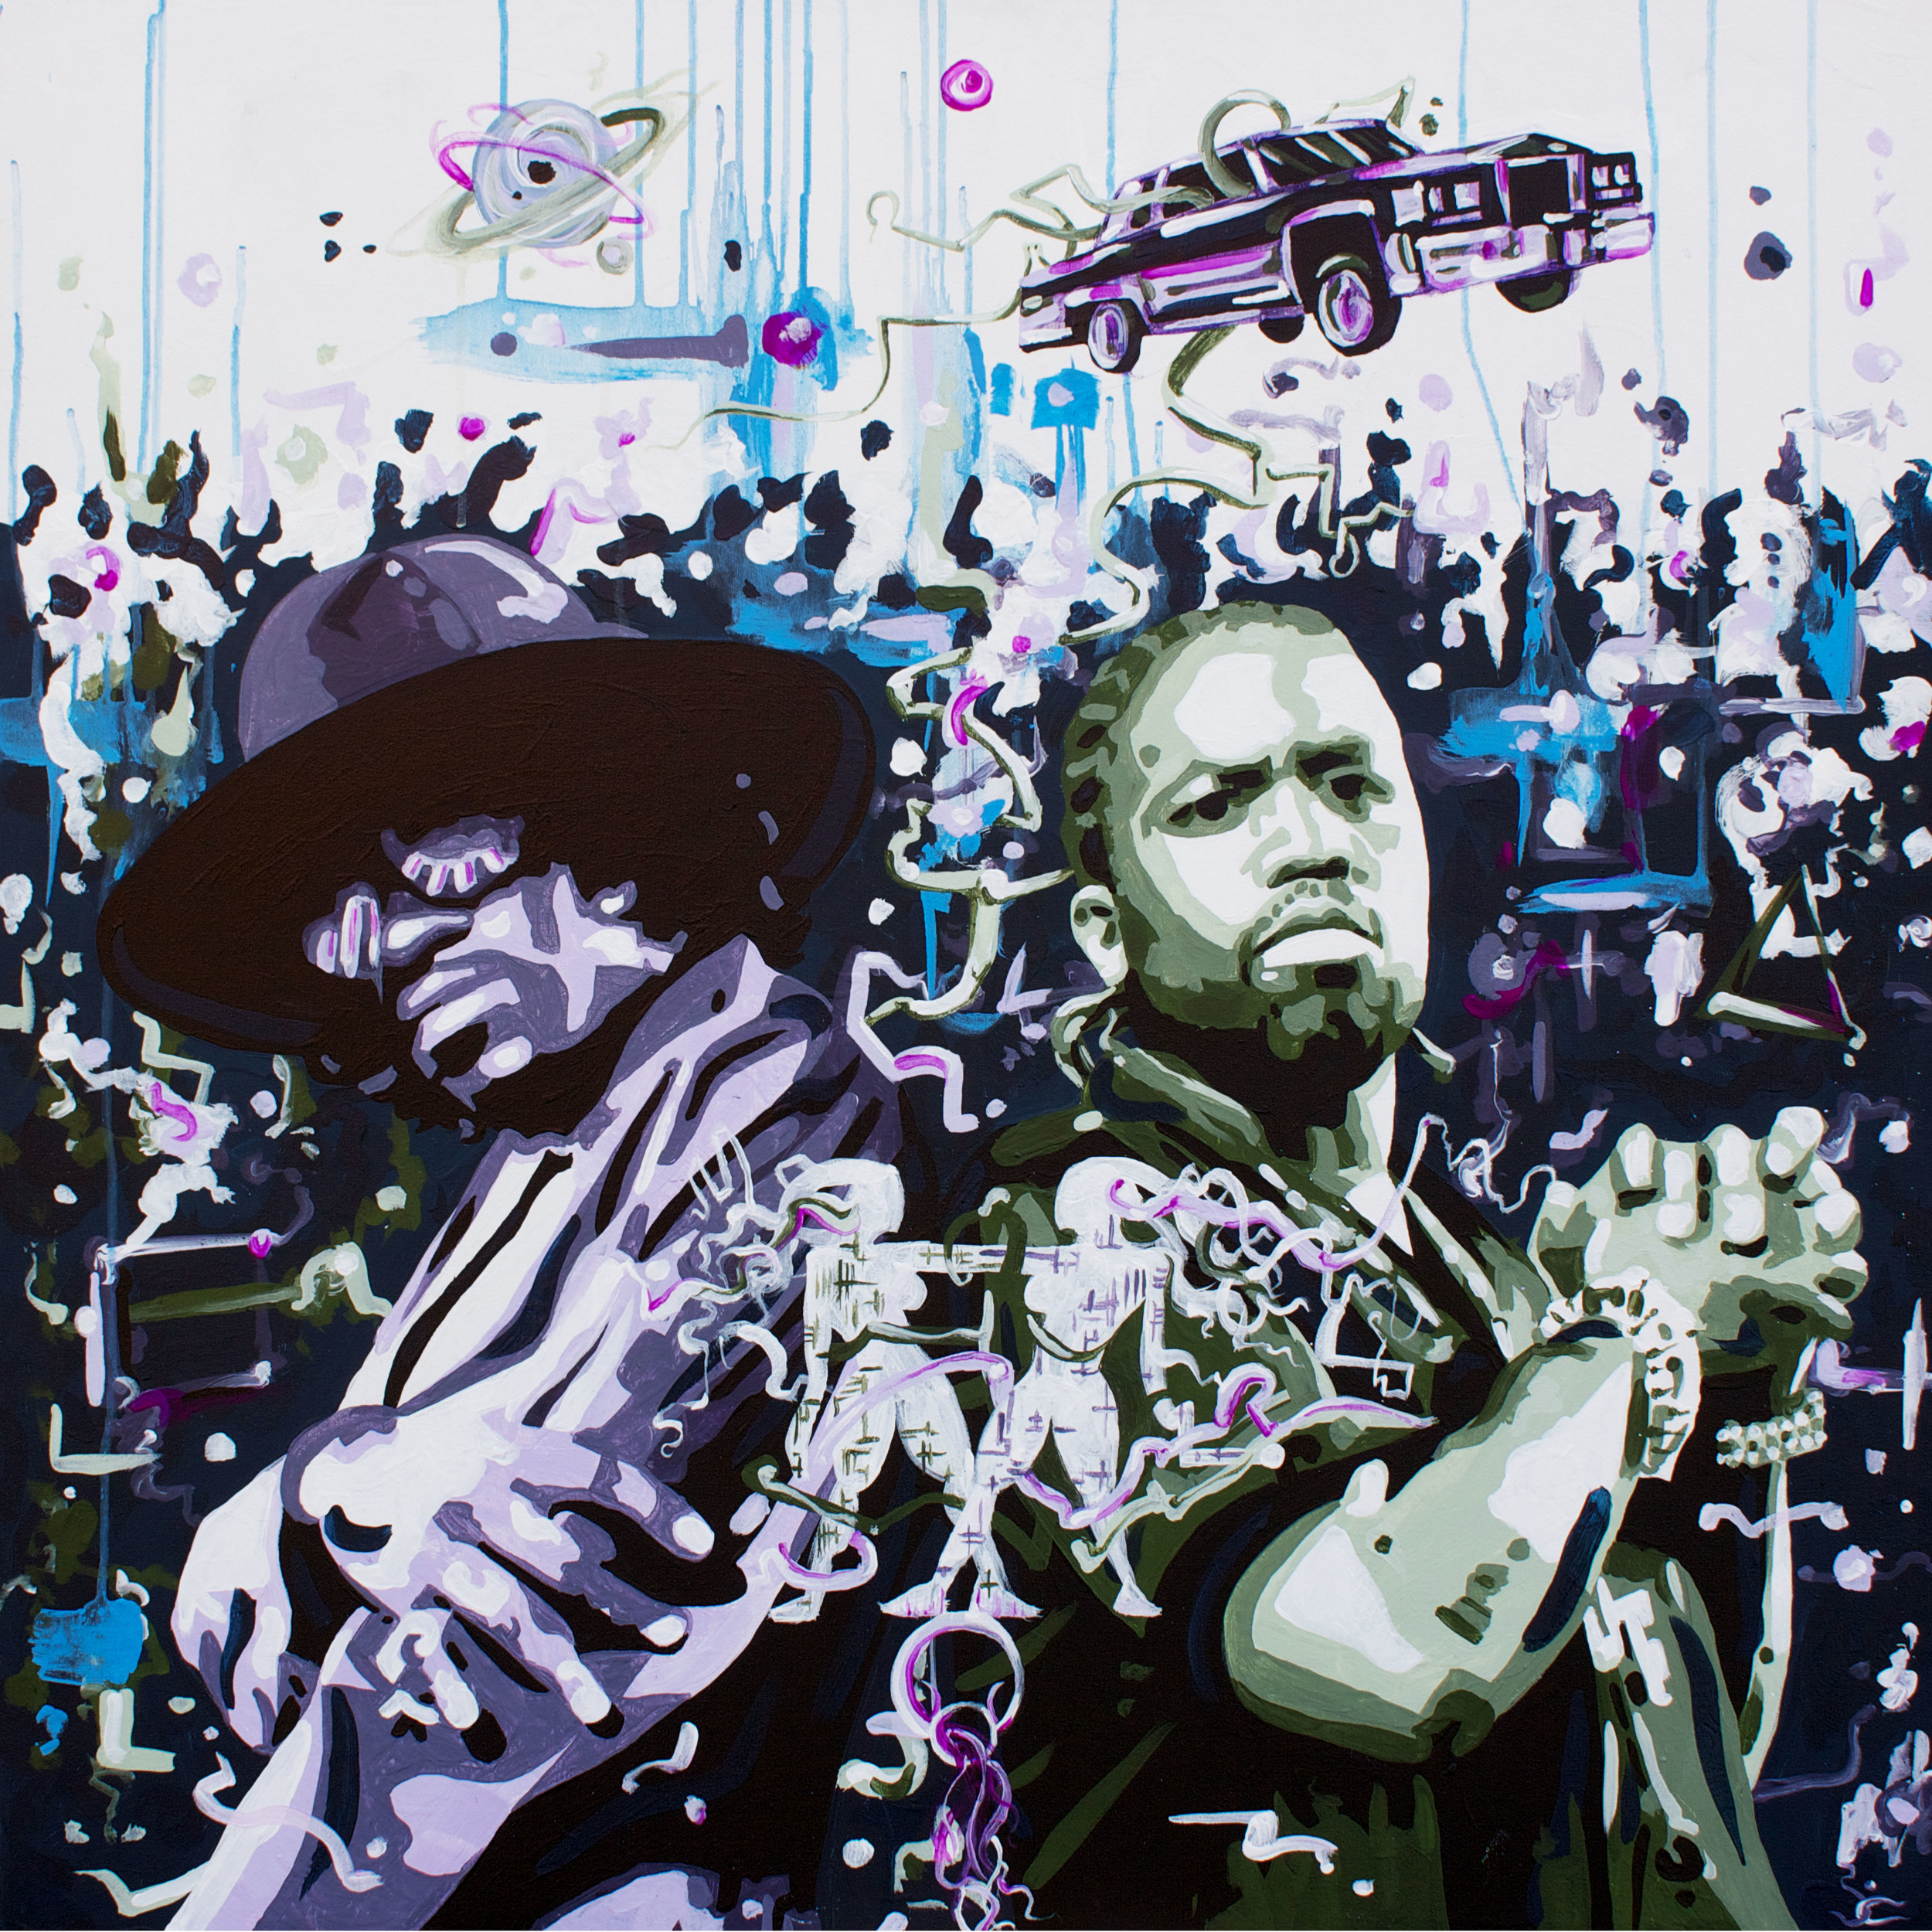 Soularintuisticdopealociusinnervision > 36x36 inch Acrylic Painting on canvas